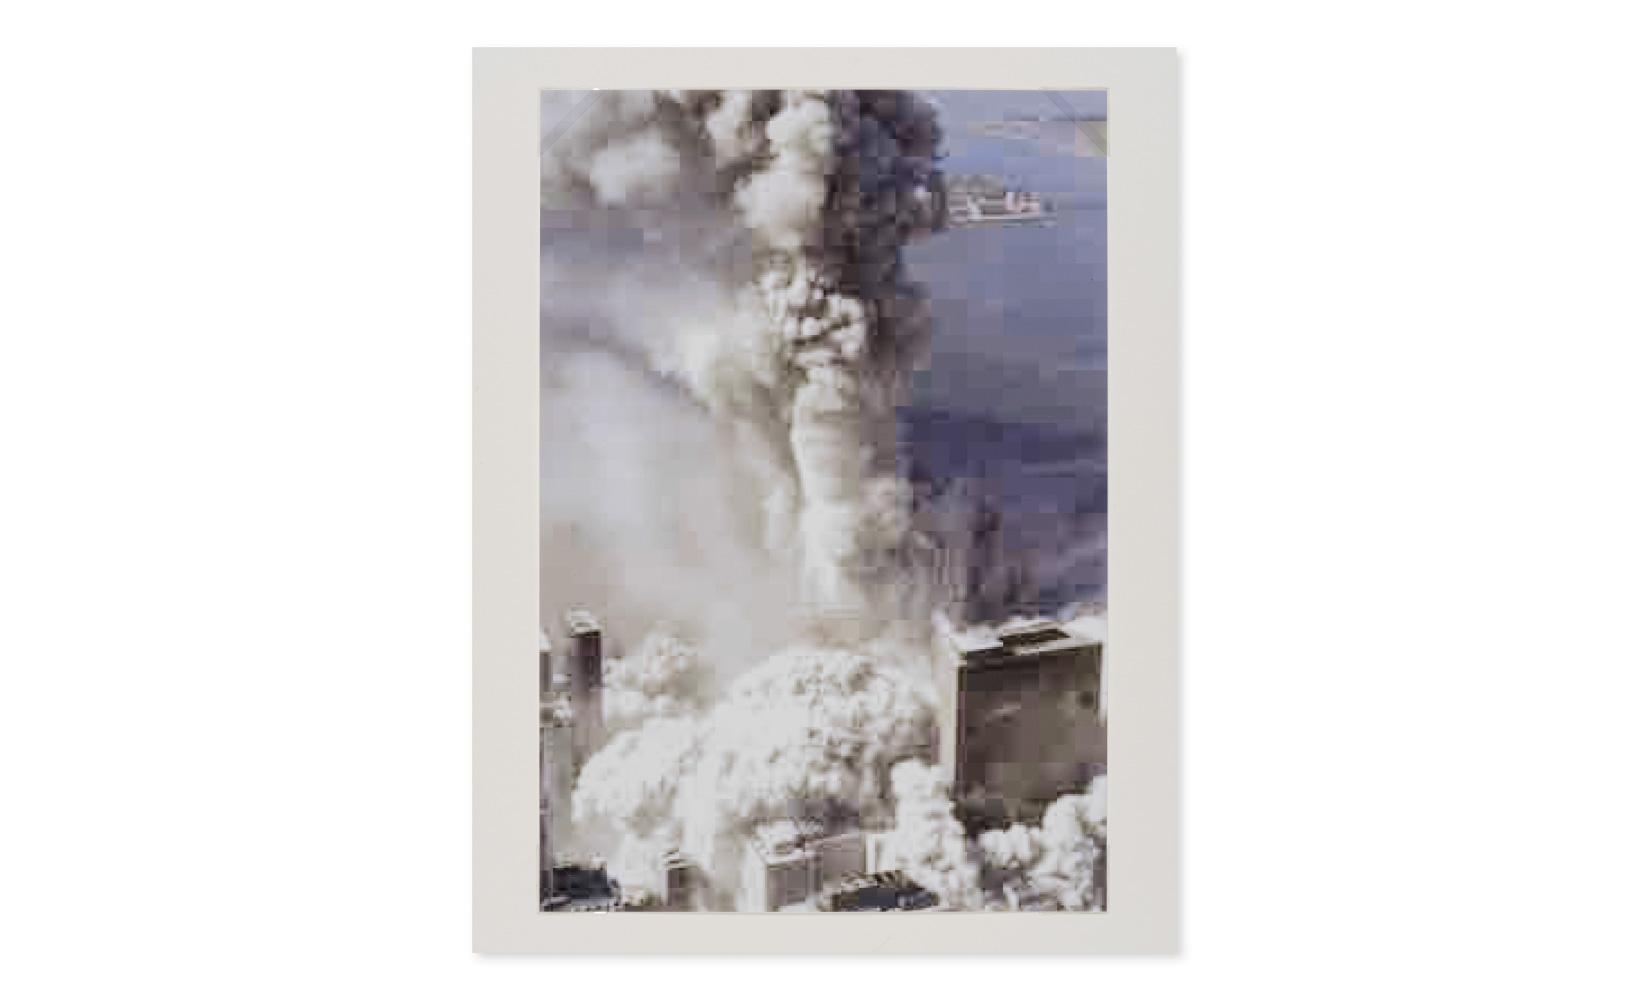 THOMAS-RUFF-TOLUCA-EDITIONS-OLIVIER-ANDREOTTI-09.jpg